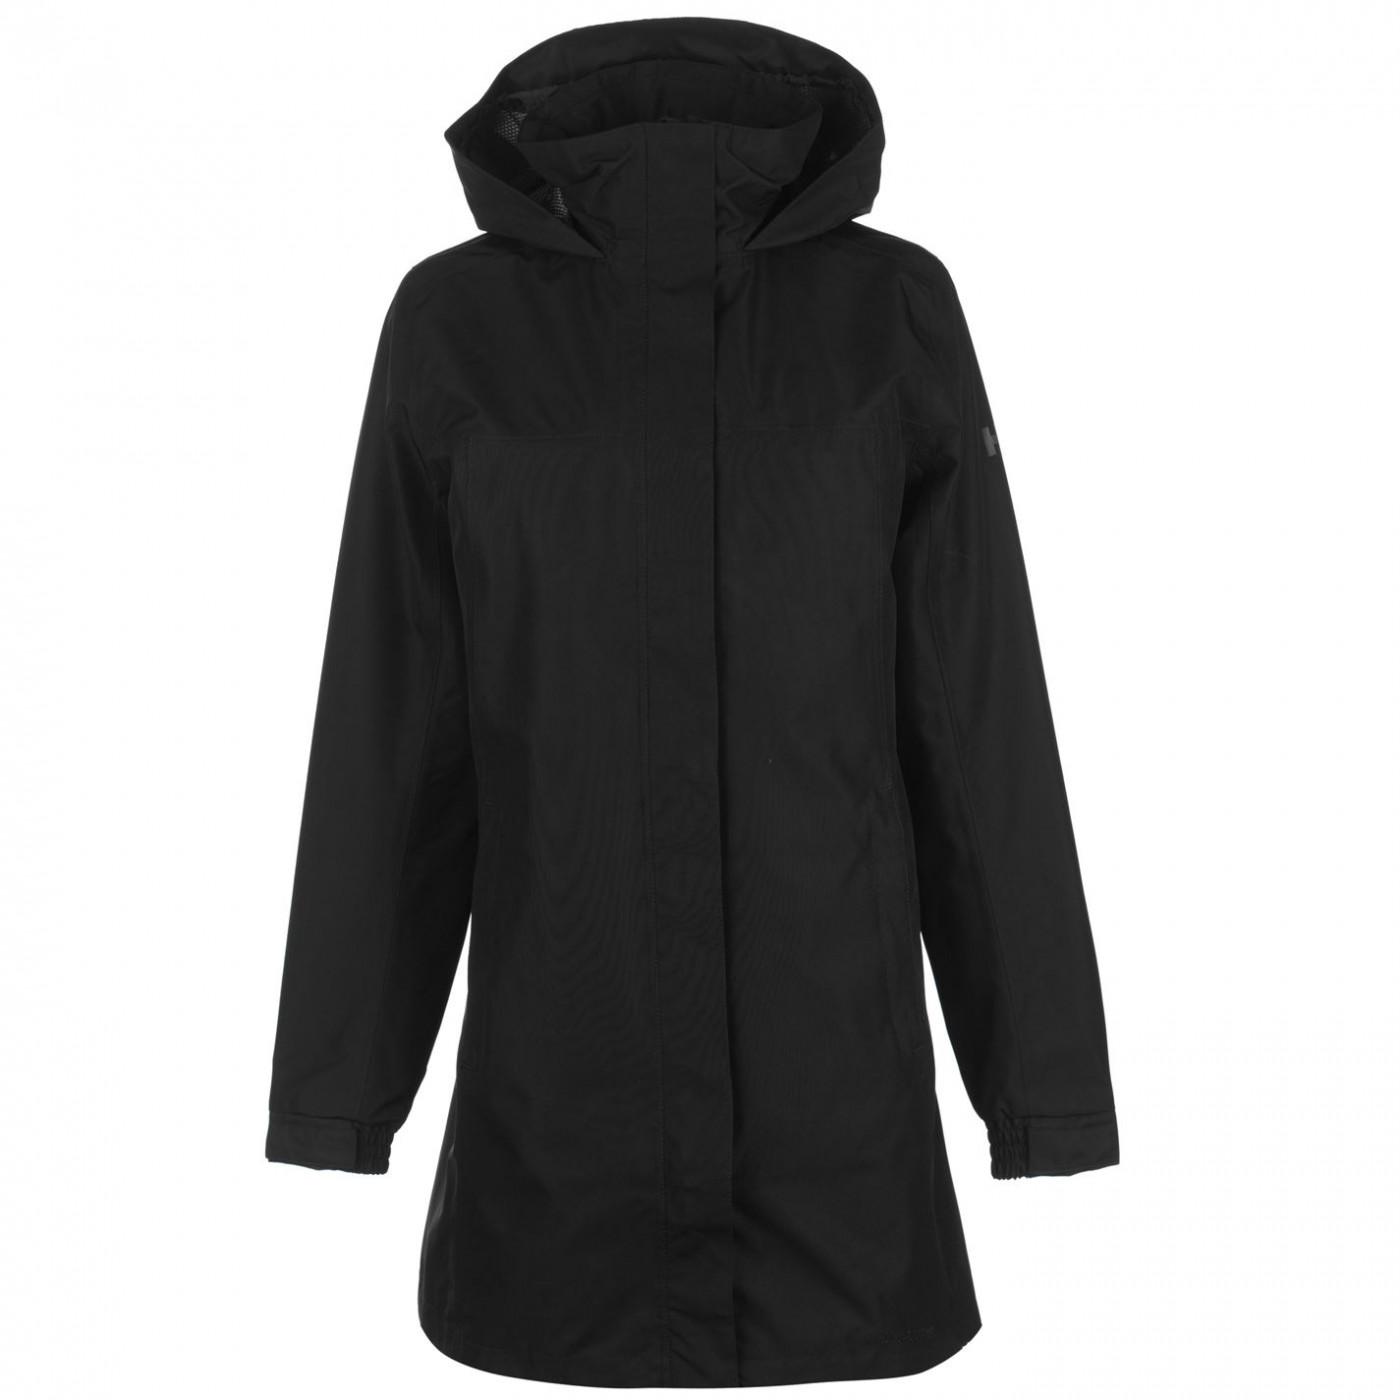 Gelert Storm Parka Jacket Ladies GLAMI.hu